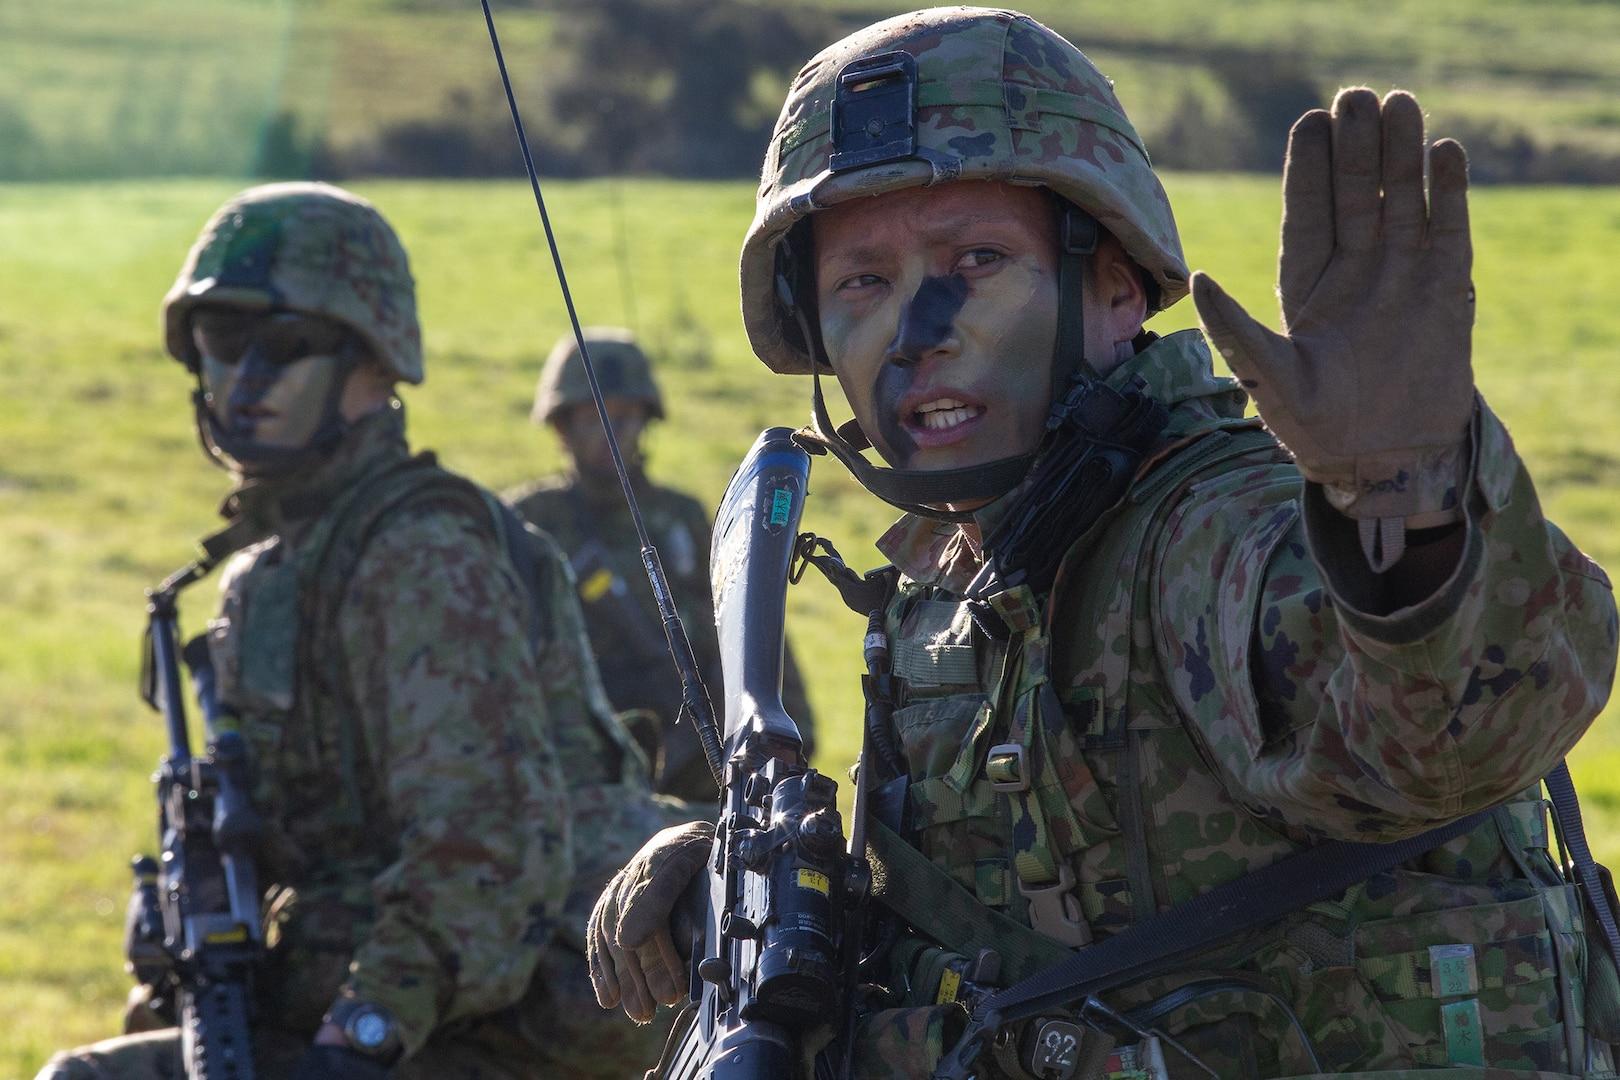 Iron Fist 2019 Strengthens U.S.-Japan Alliance; Certifies Amphibious Rapid Deployment Brigade